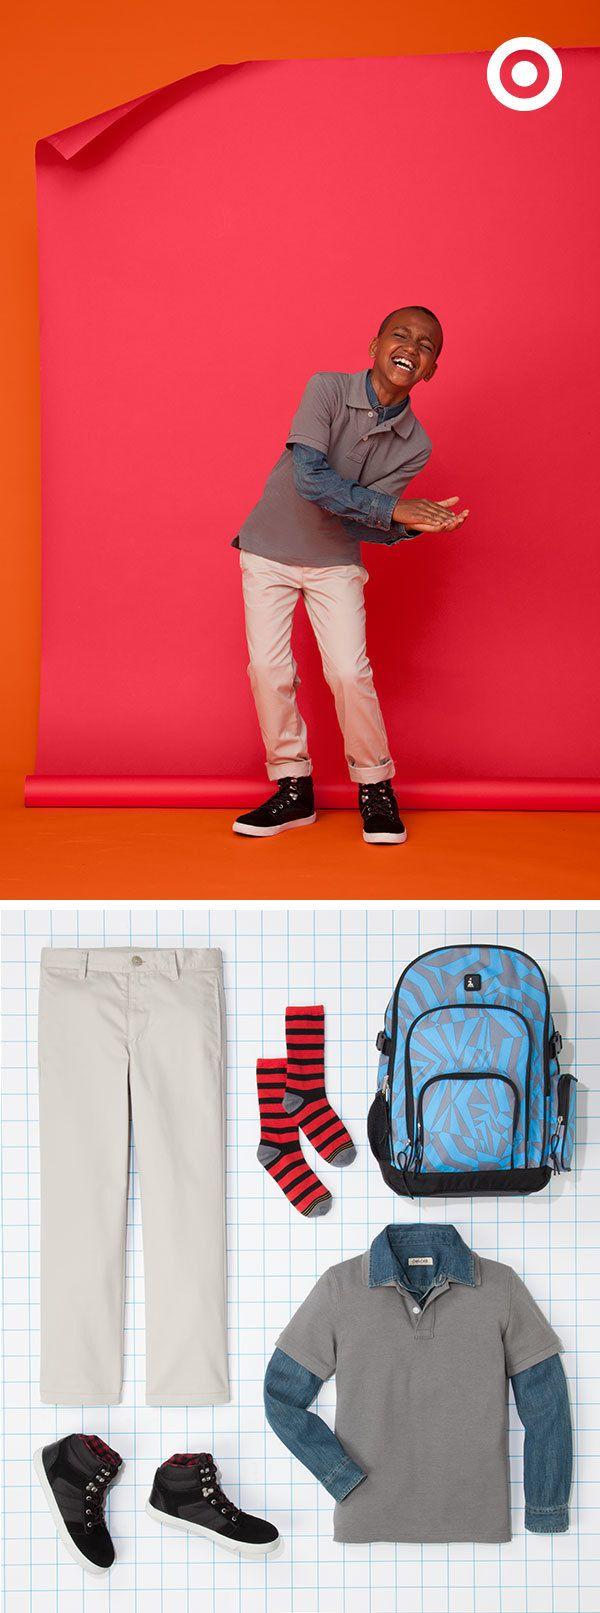 Adding a long-sleeved shirt under a boys' school uniform is a stylish way to add an original touch.